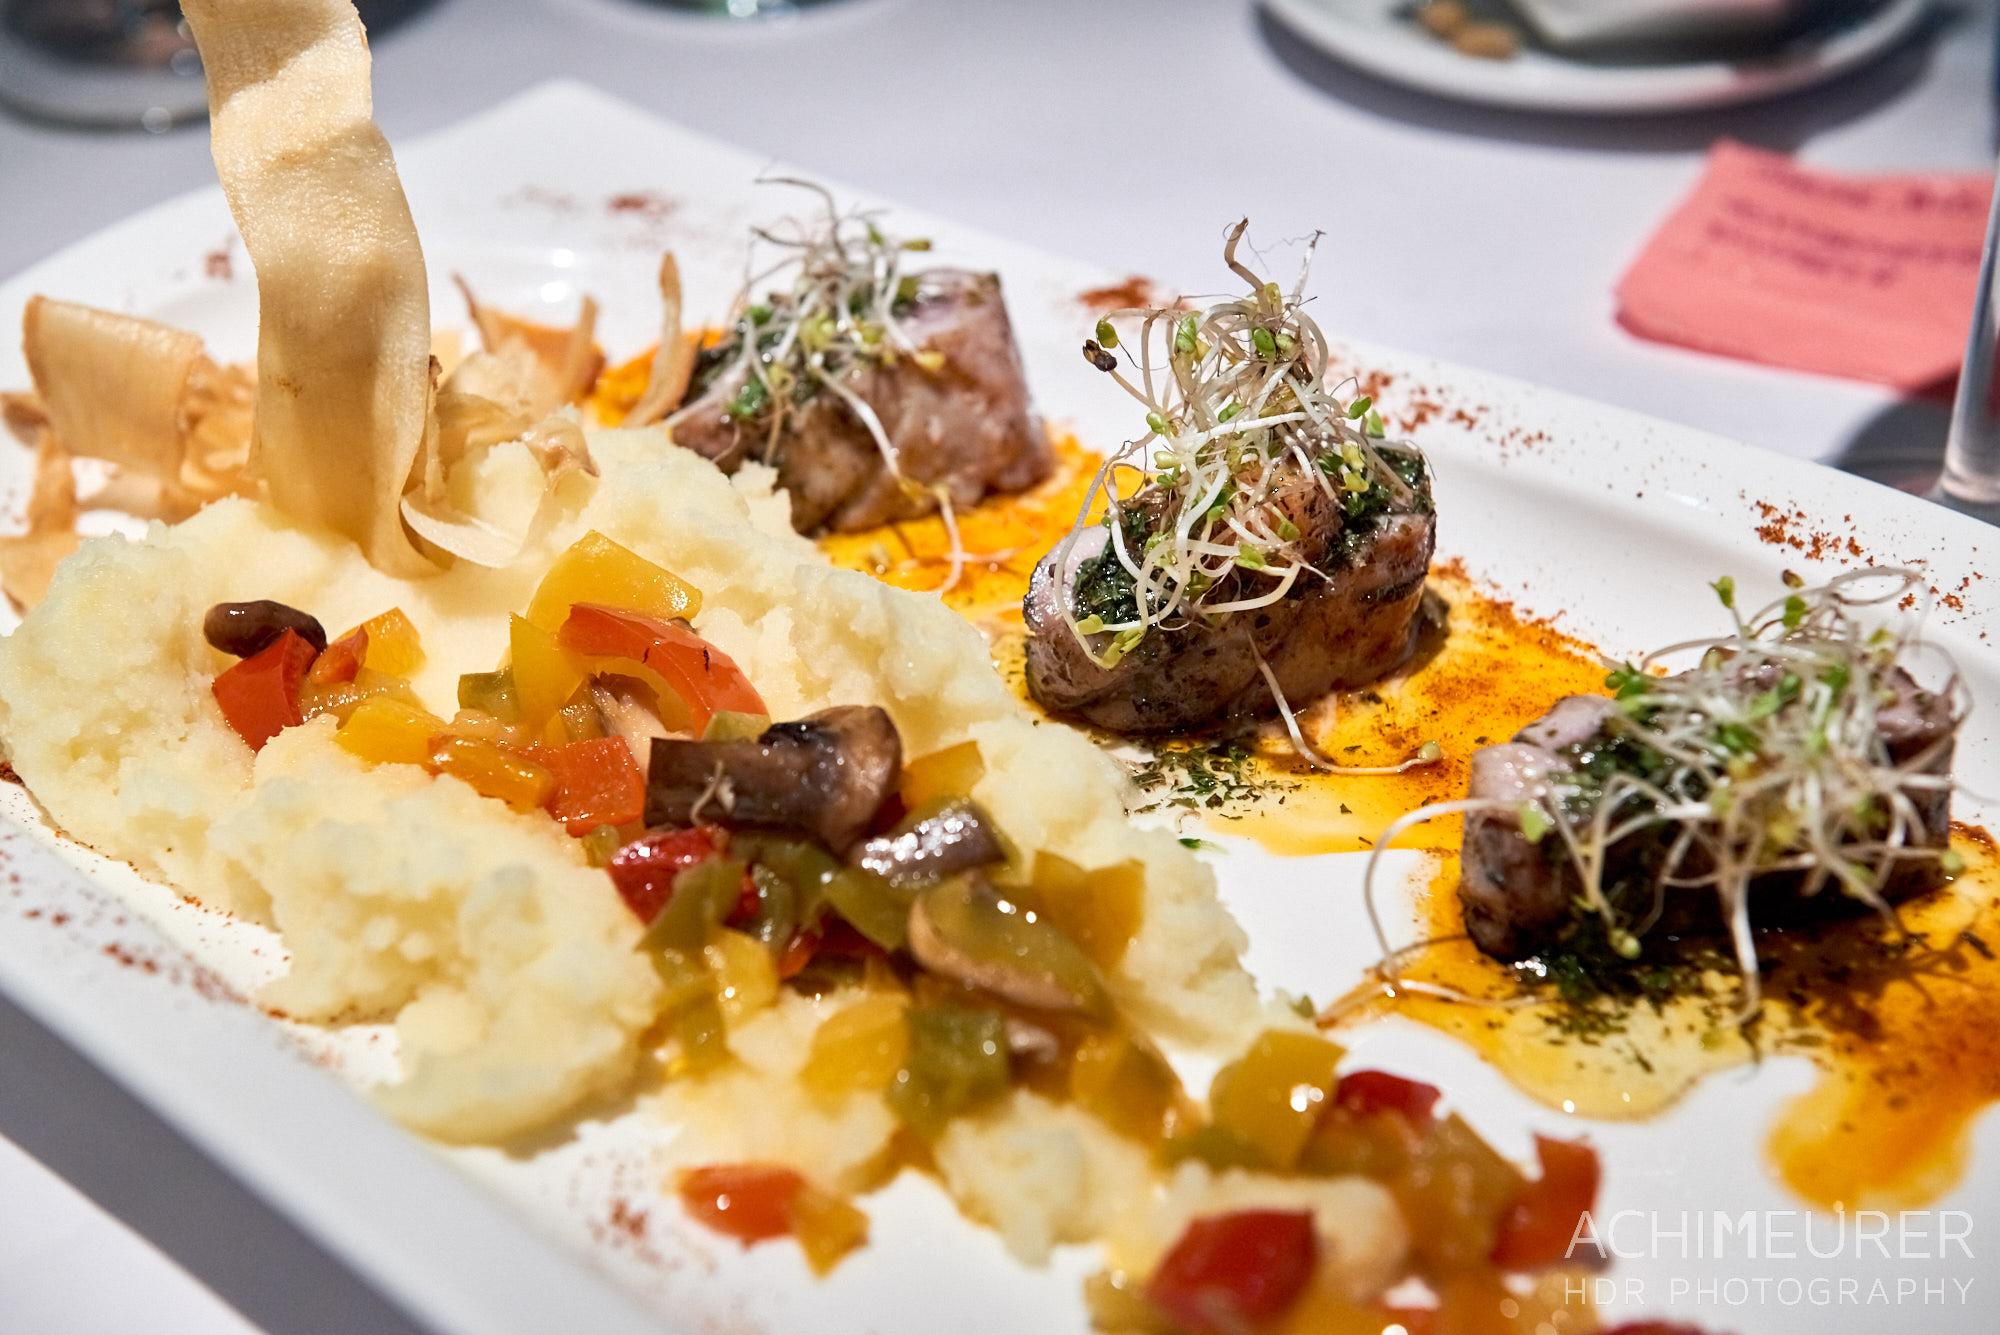 Abendessen in Vilafranca, Katalonien, Spanien by AchimMeurer.com .